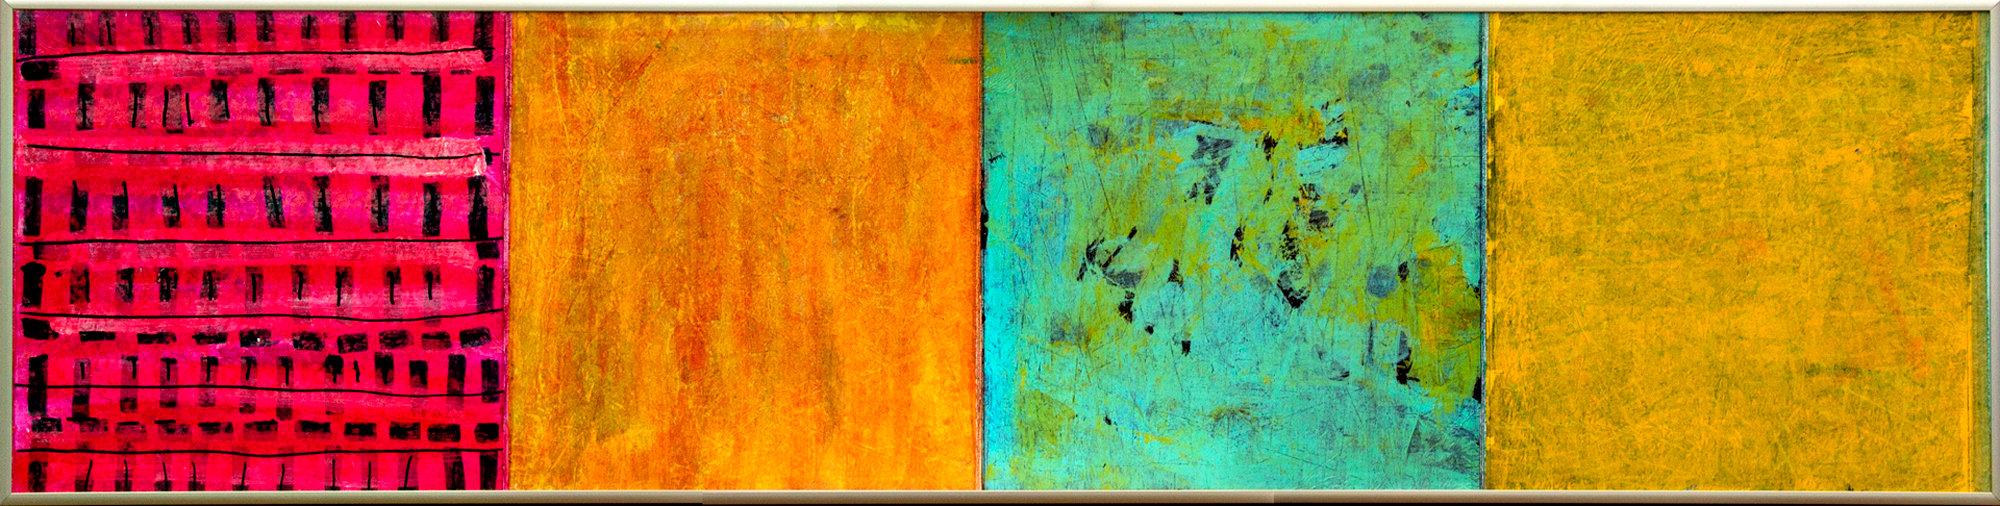 Medium Density Overlay Panel ~ Delicata by joan gold mixed media painting artful home